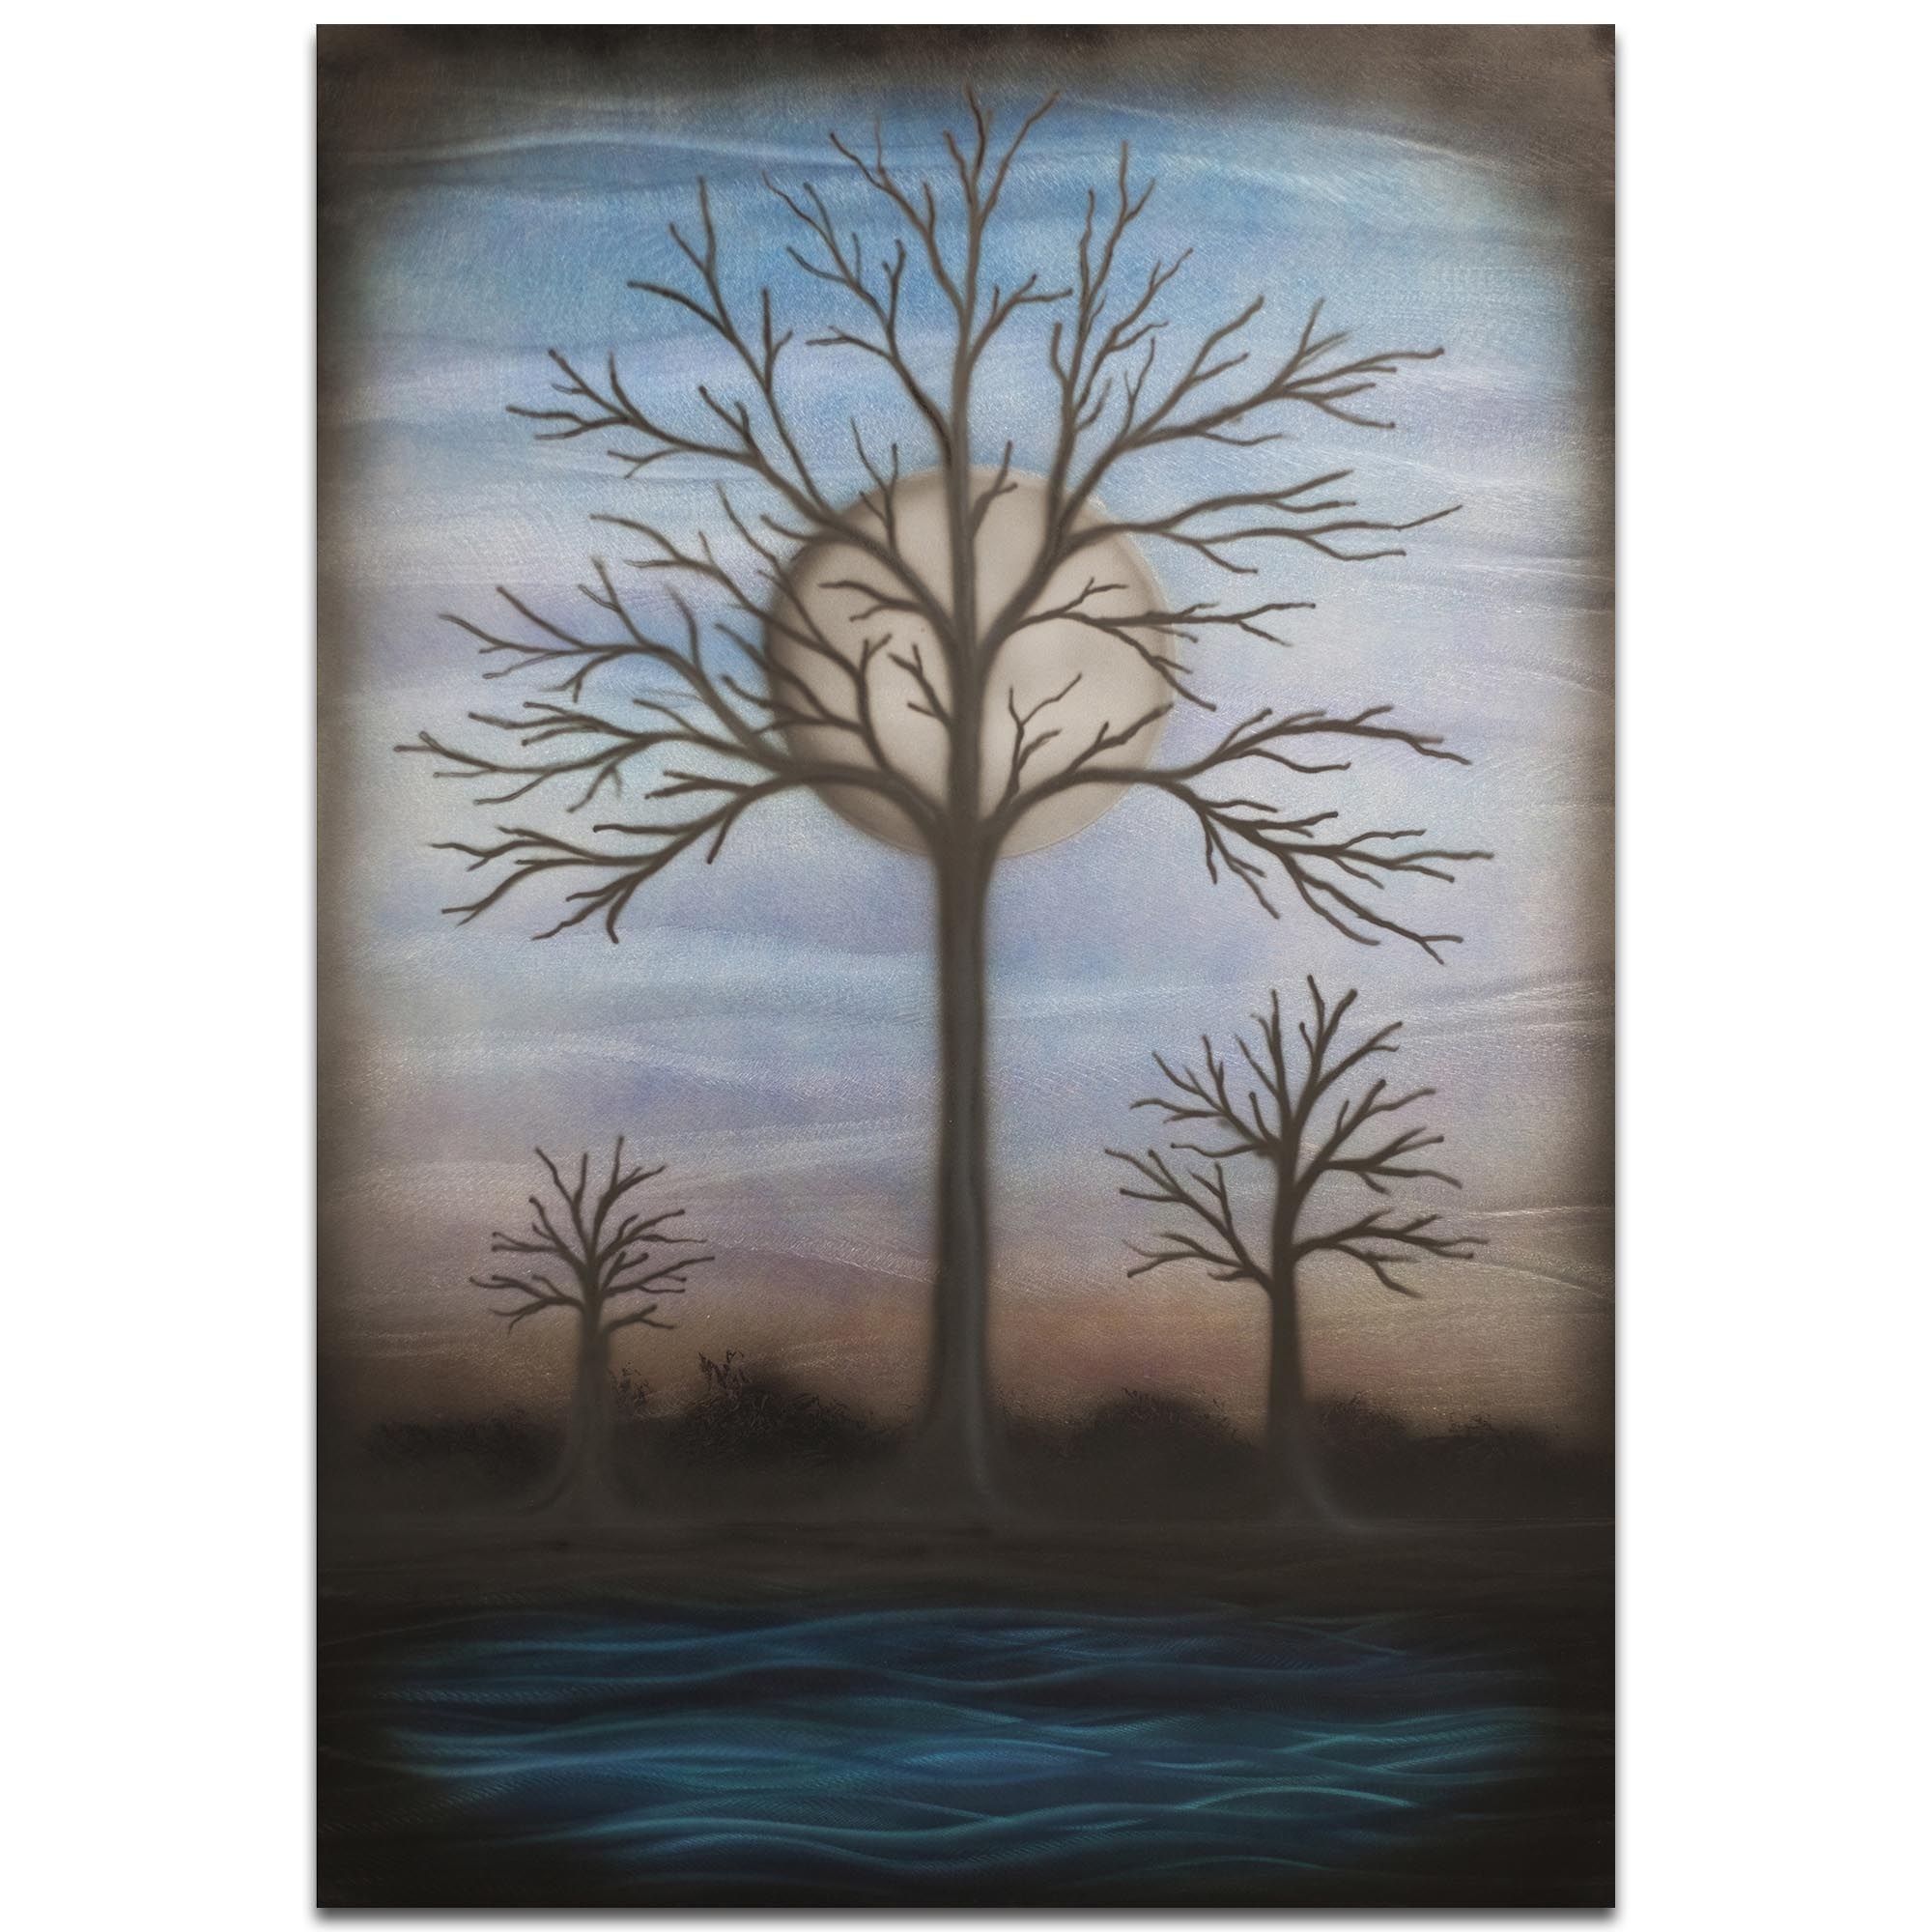 Contemporary Wall Art 'Full Moon' - Bare Trees Decor on Metal or Plexiglass